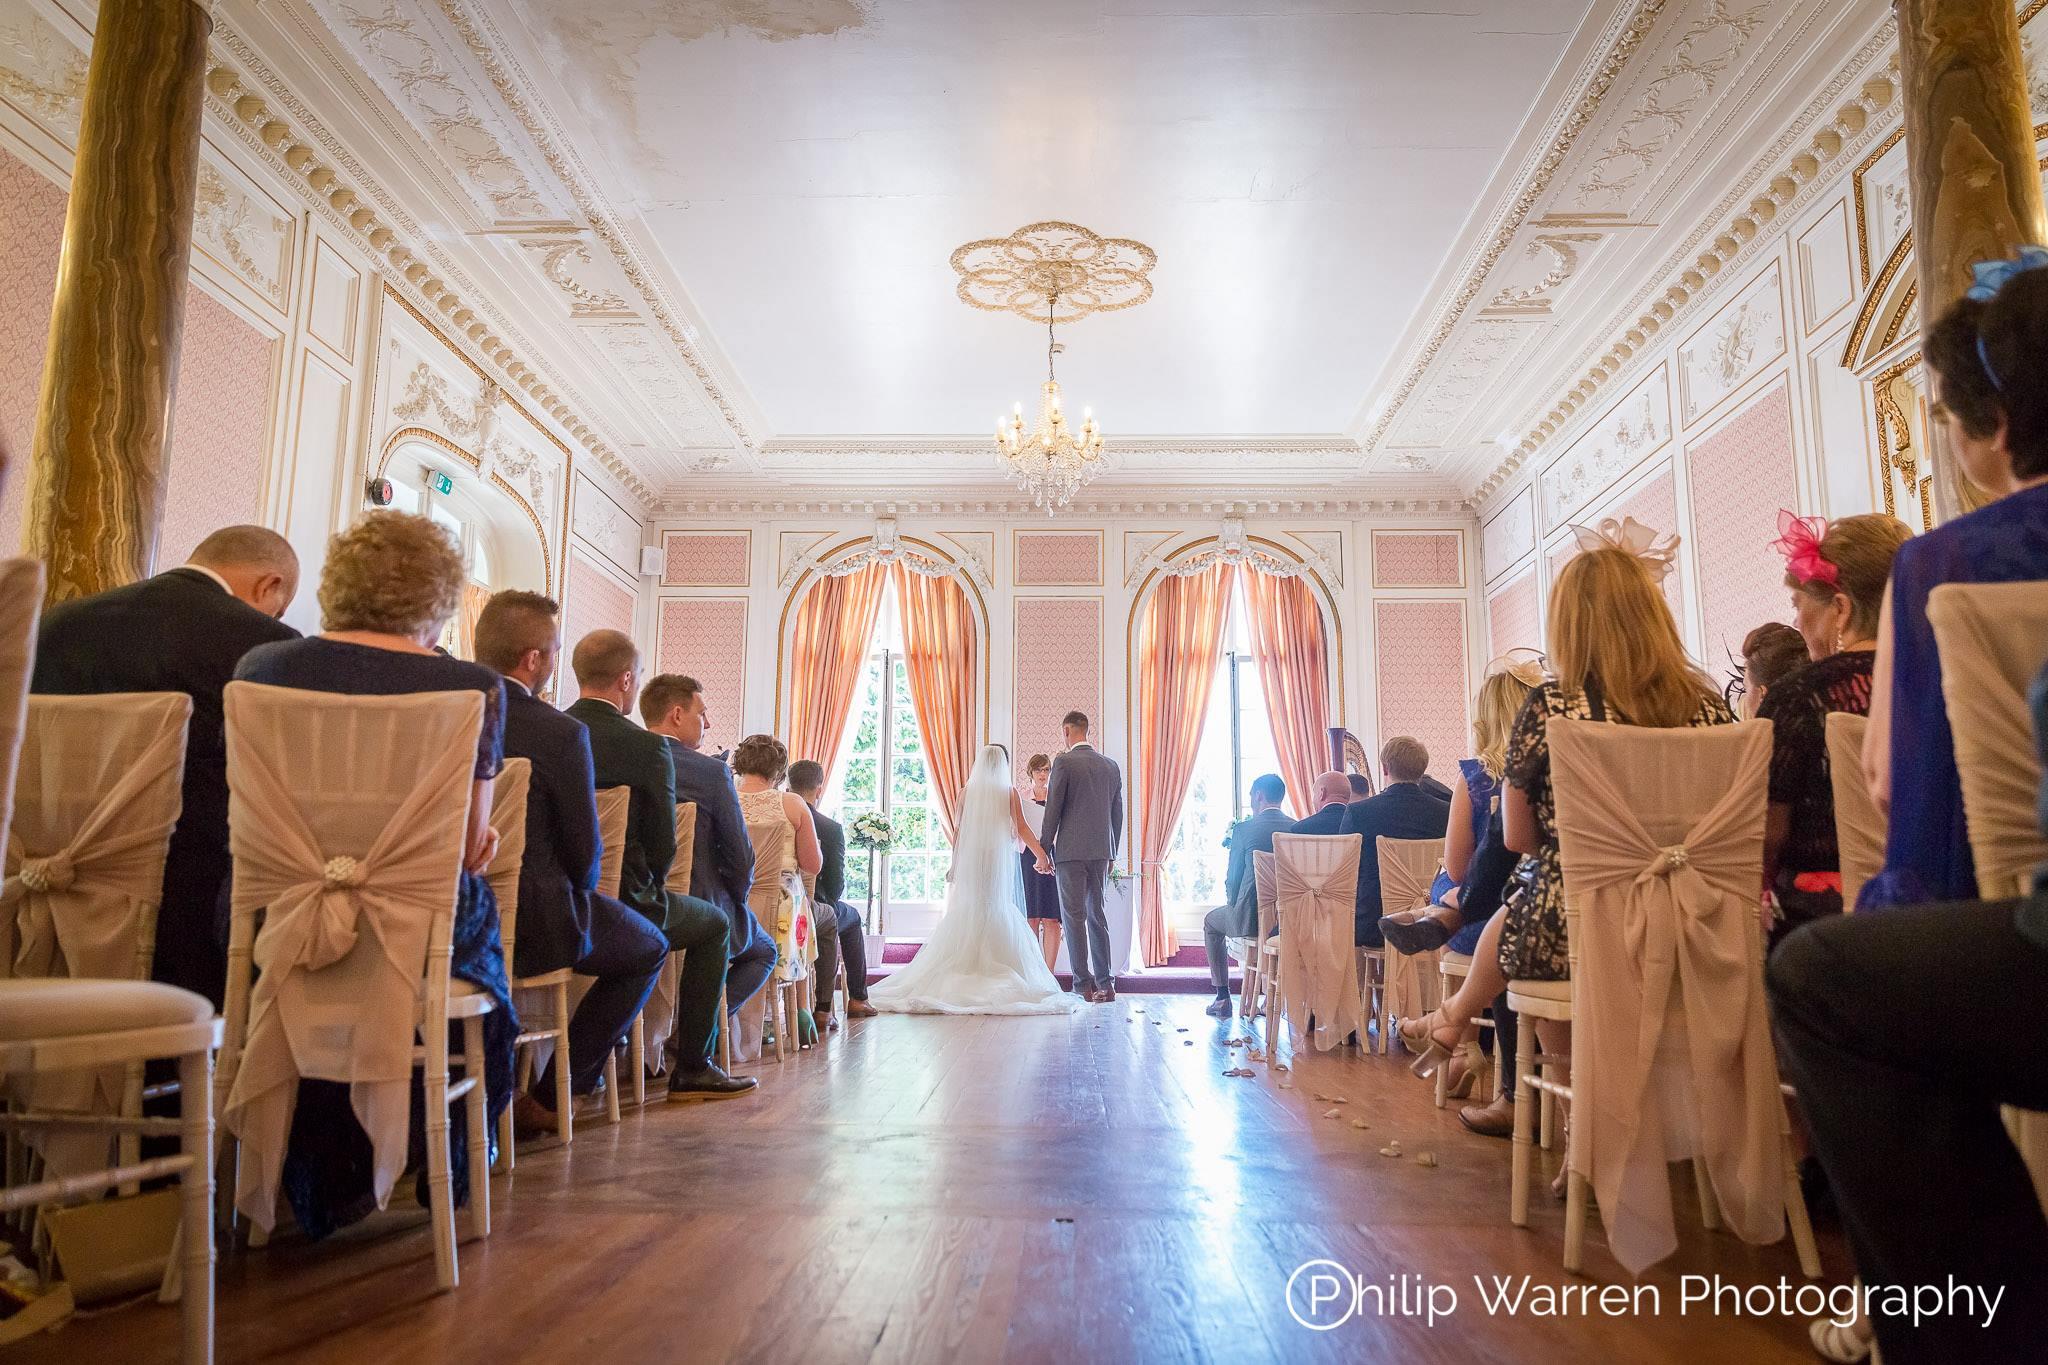 Ceremony Room at Colman